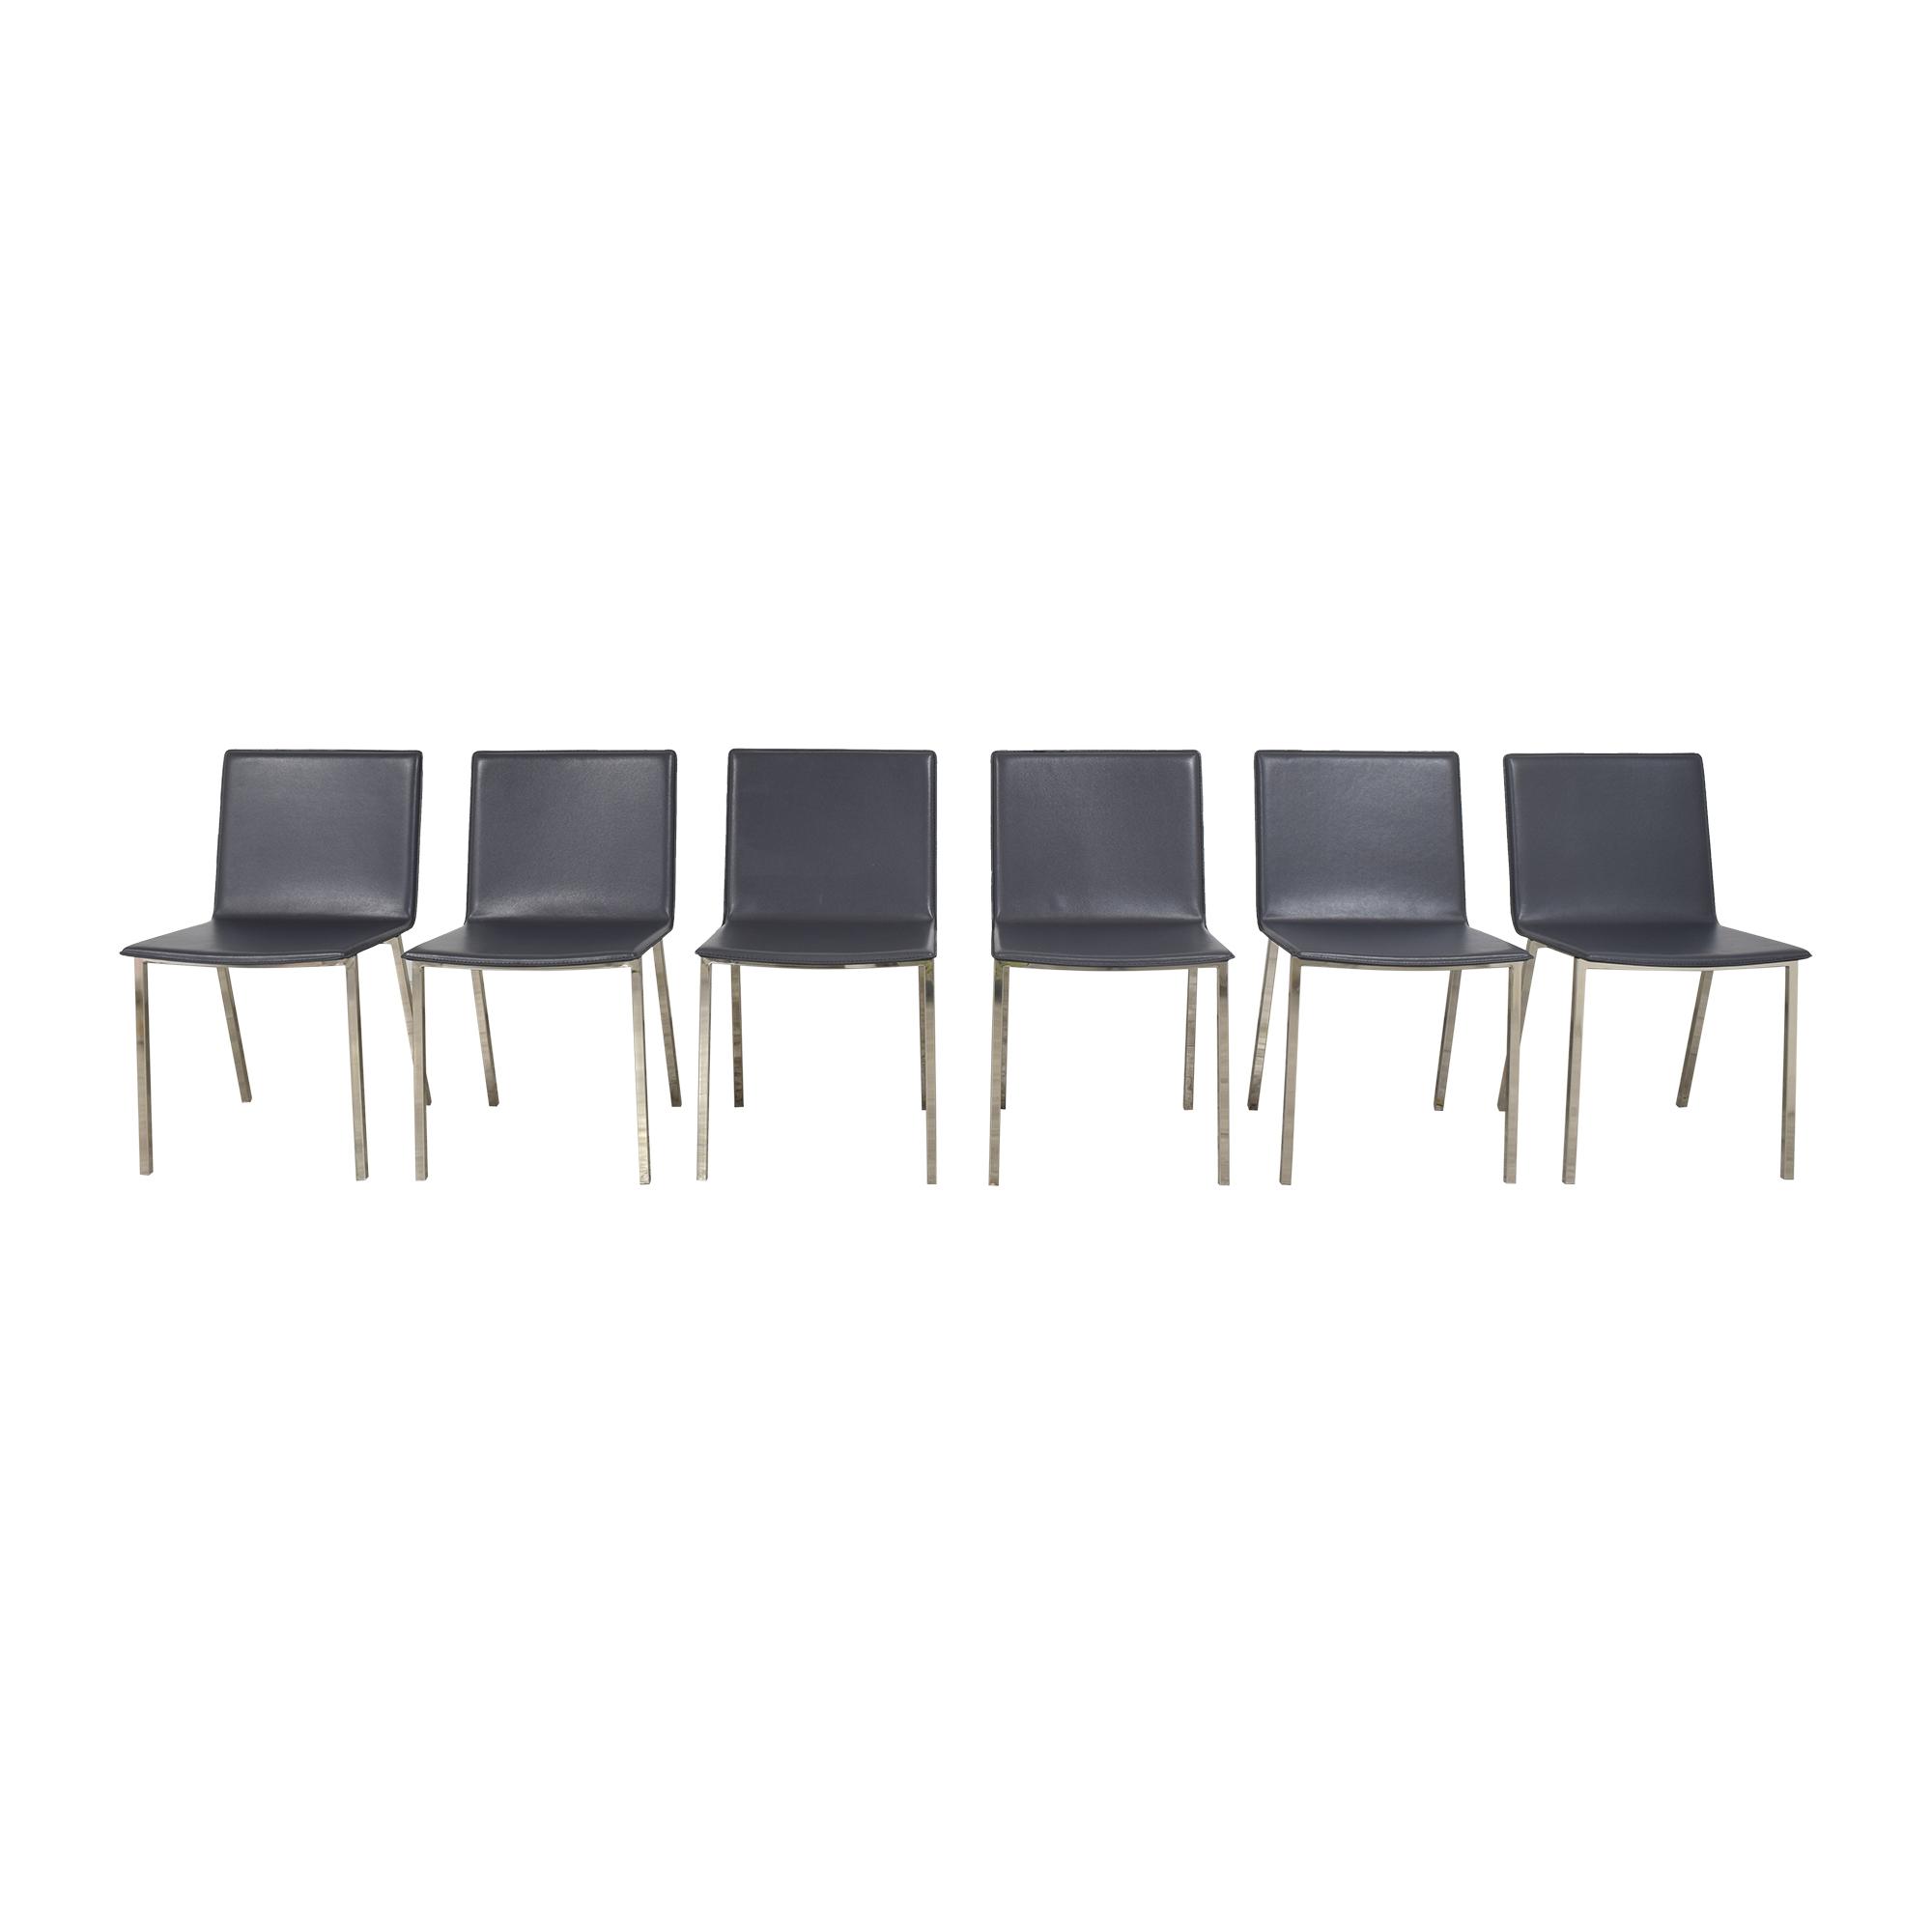 CB2 CB2 Phoenix Dining Chairs used